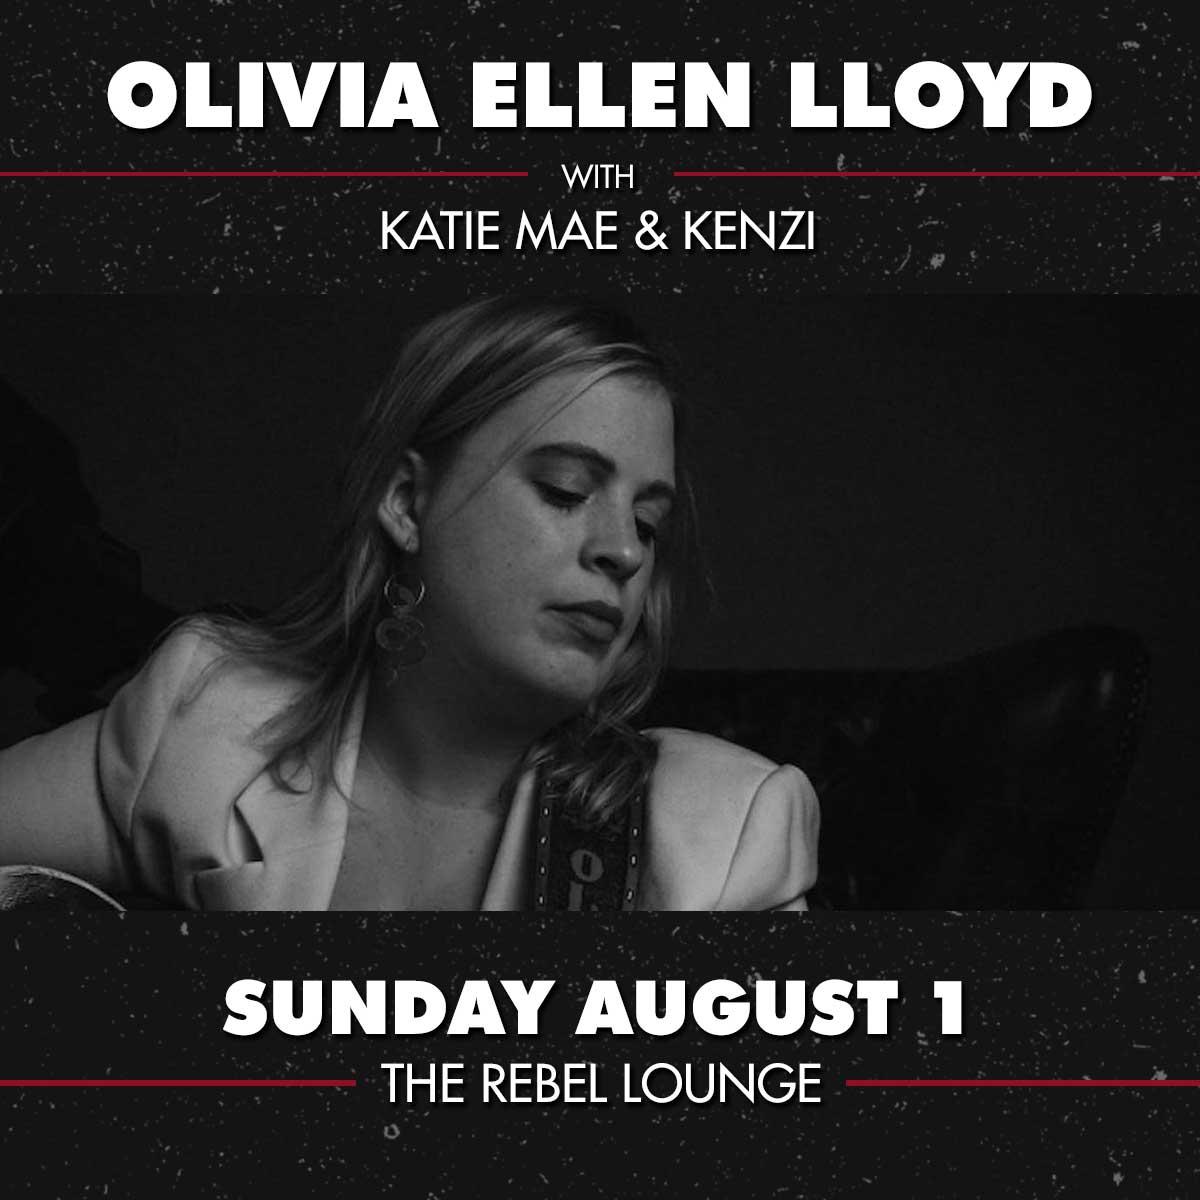 OLIVIA ELLEN LLOYD: Main Image